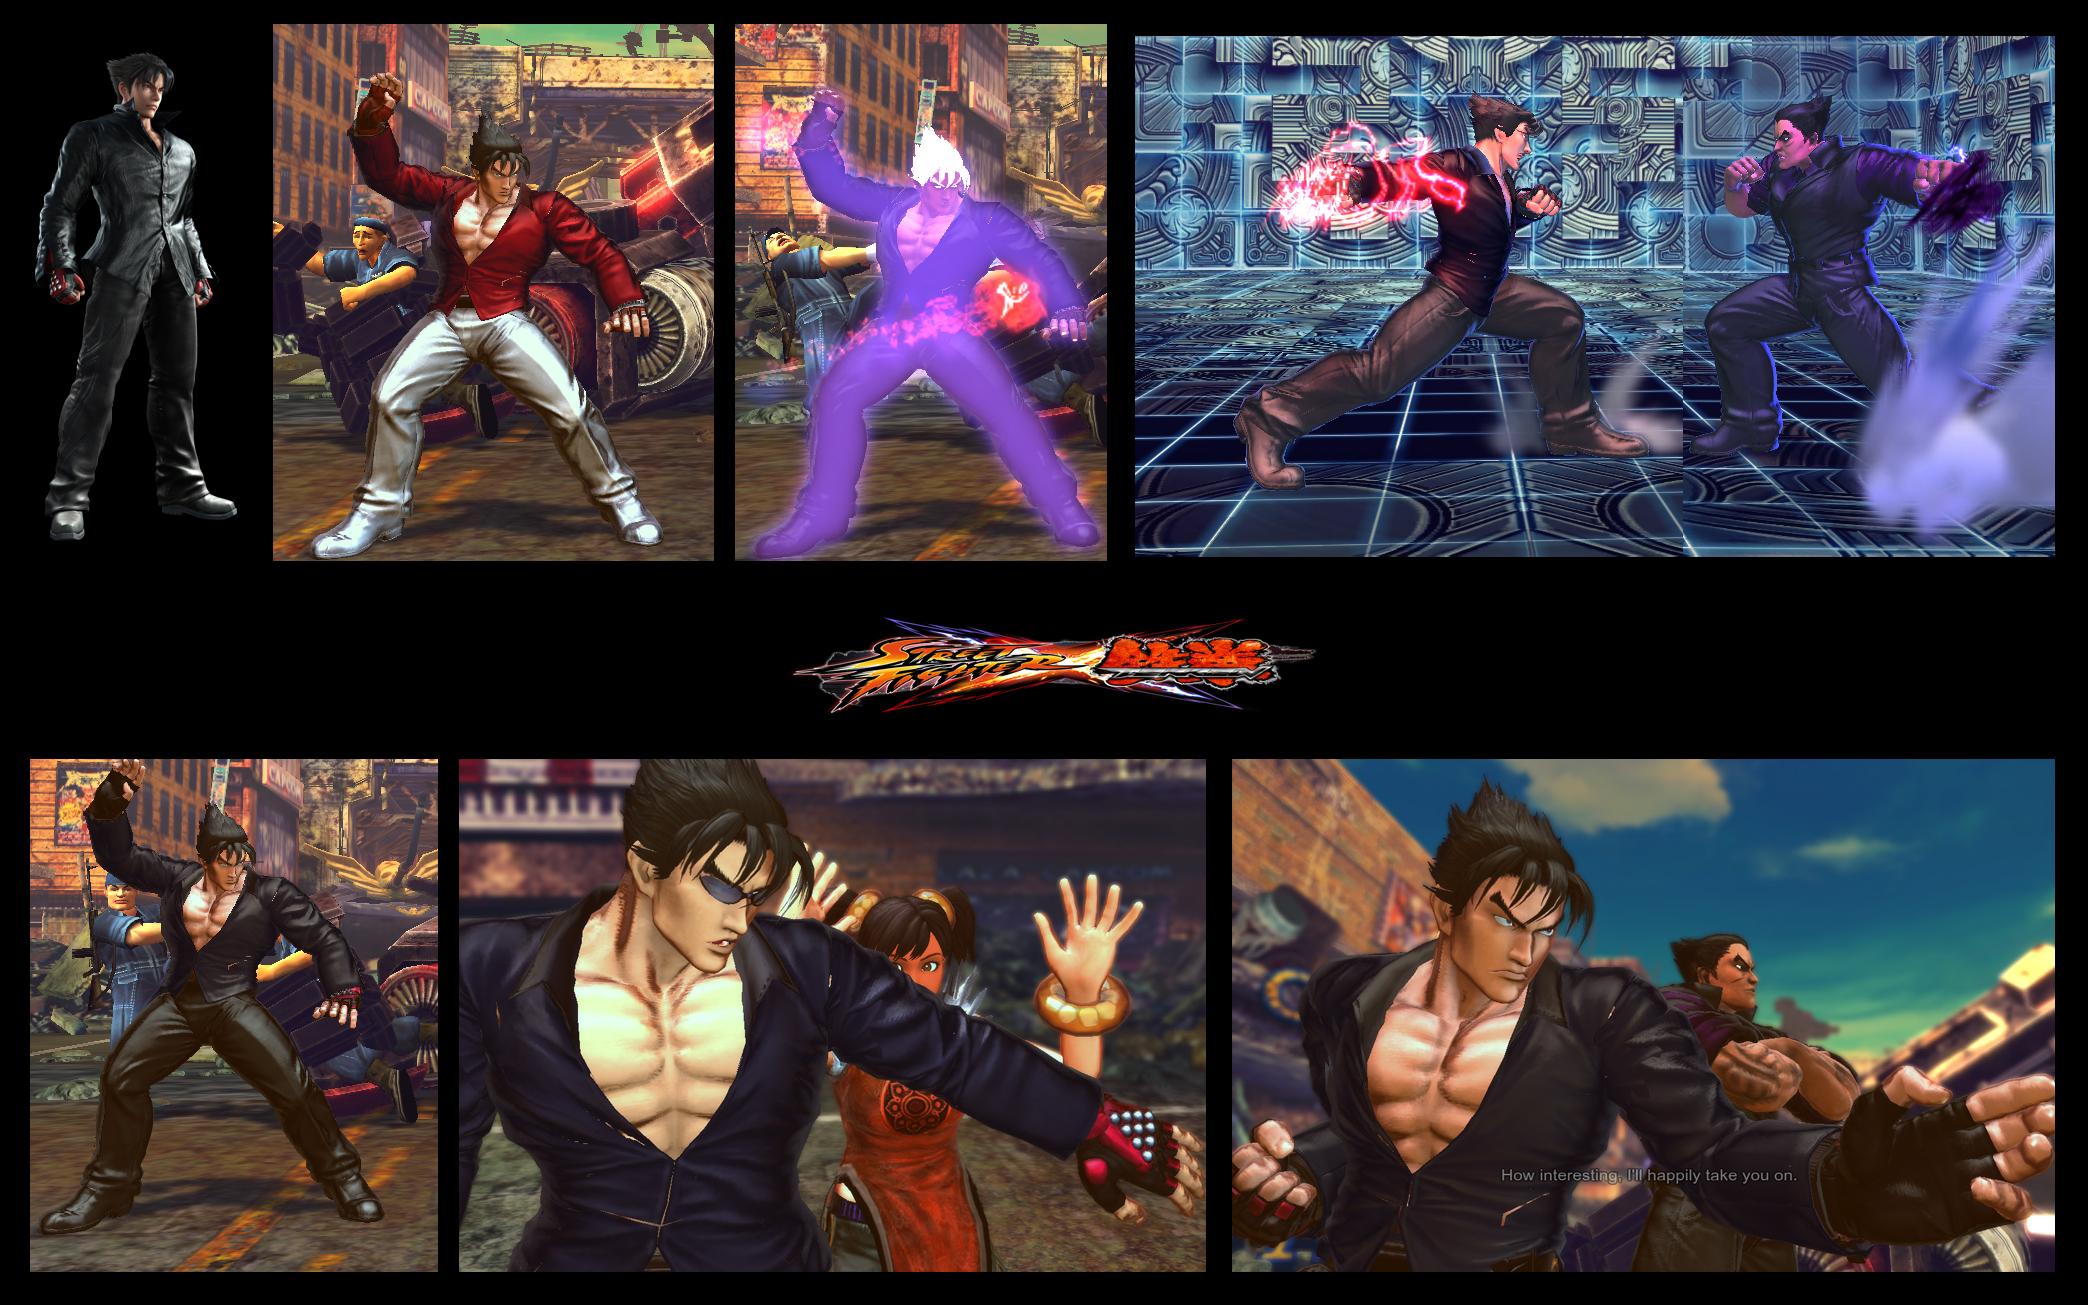 Sf X Tekken Jin From Blood Vengeance Inspiration By Monkeygigabuster On Deviantart